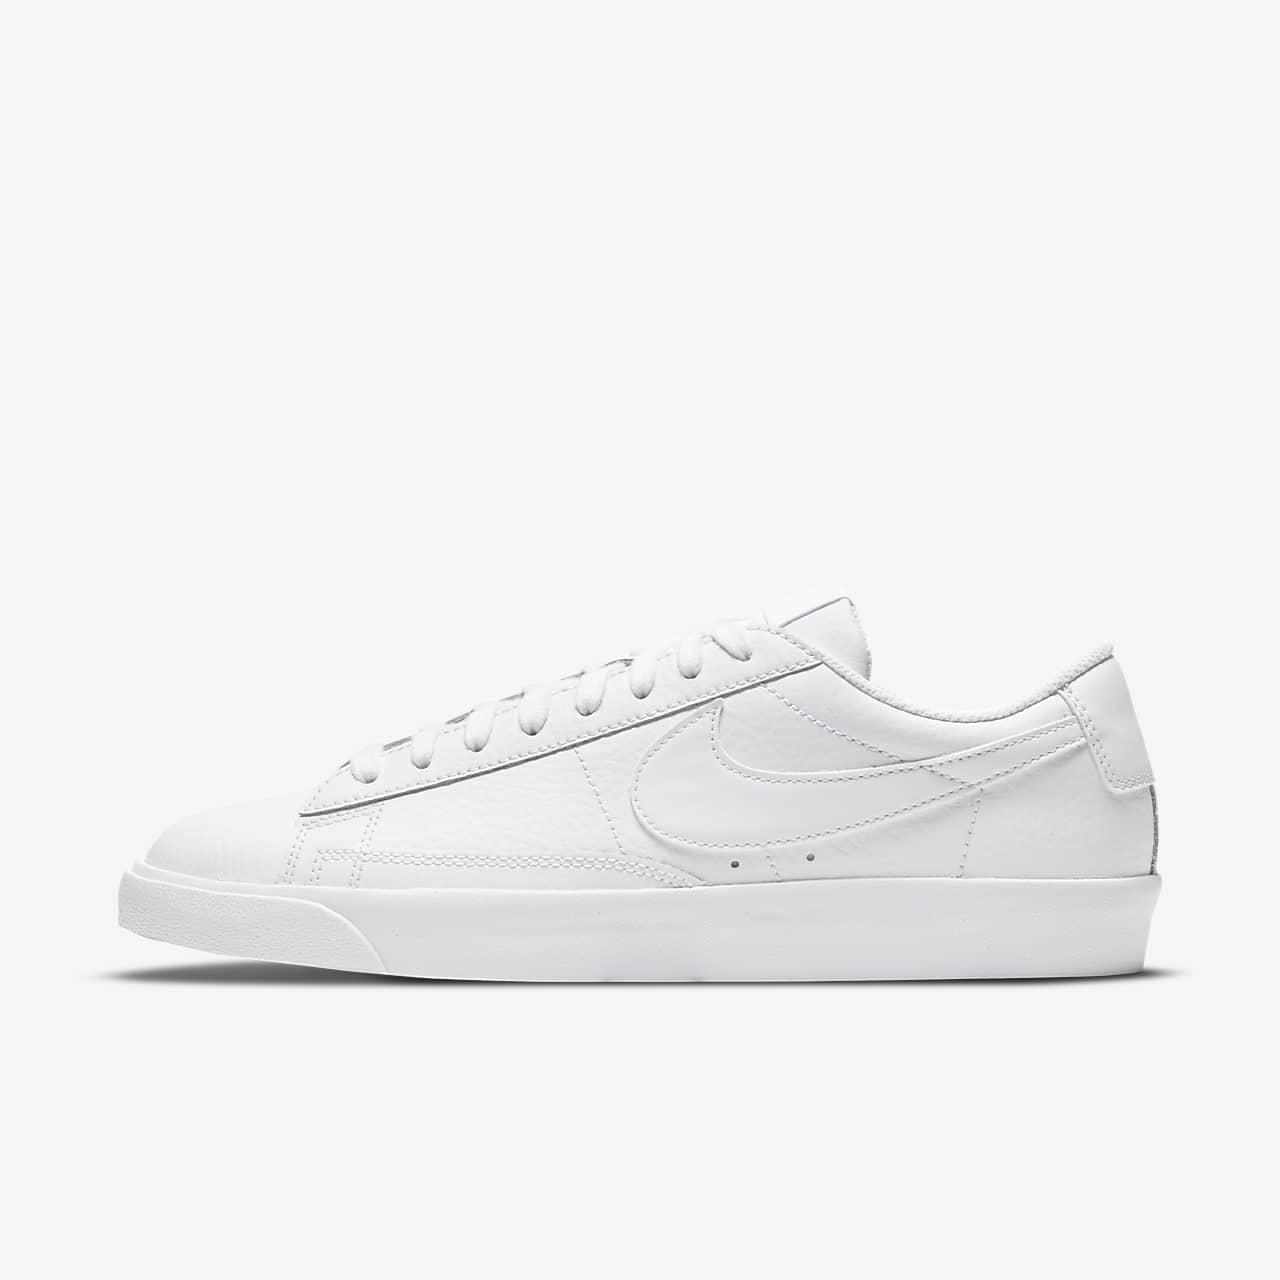 Chaussure Nike Blazer Low LE pour Homme